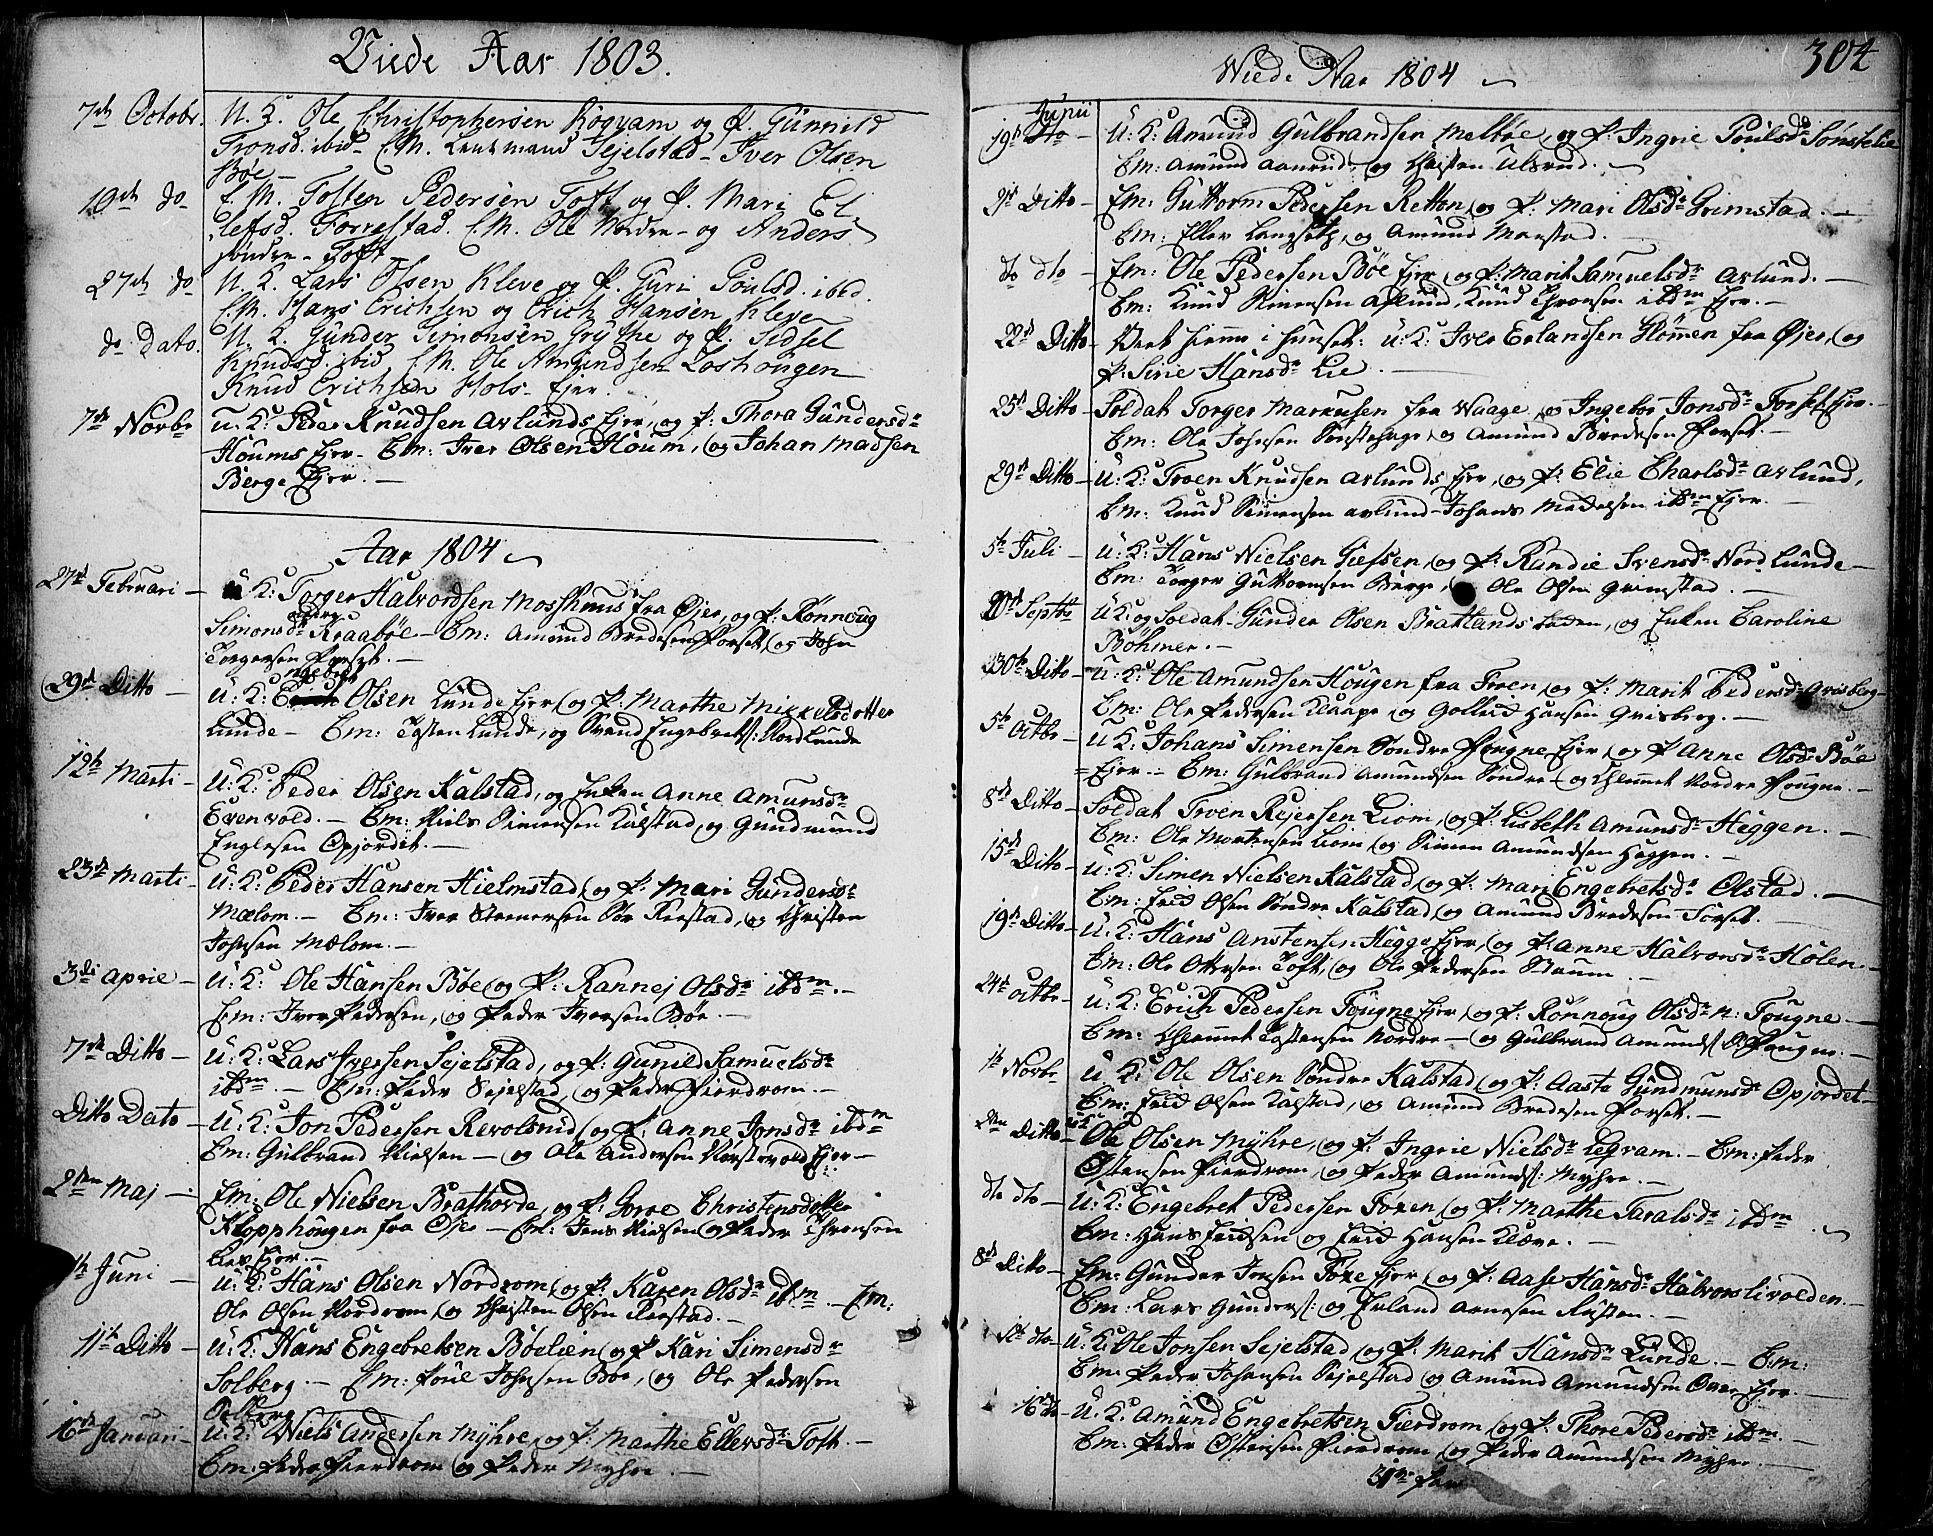 SAH, Gausdal prestekontor, Ministerialbok nr. 3, 1758-1809, s. 304